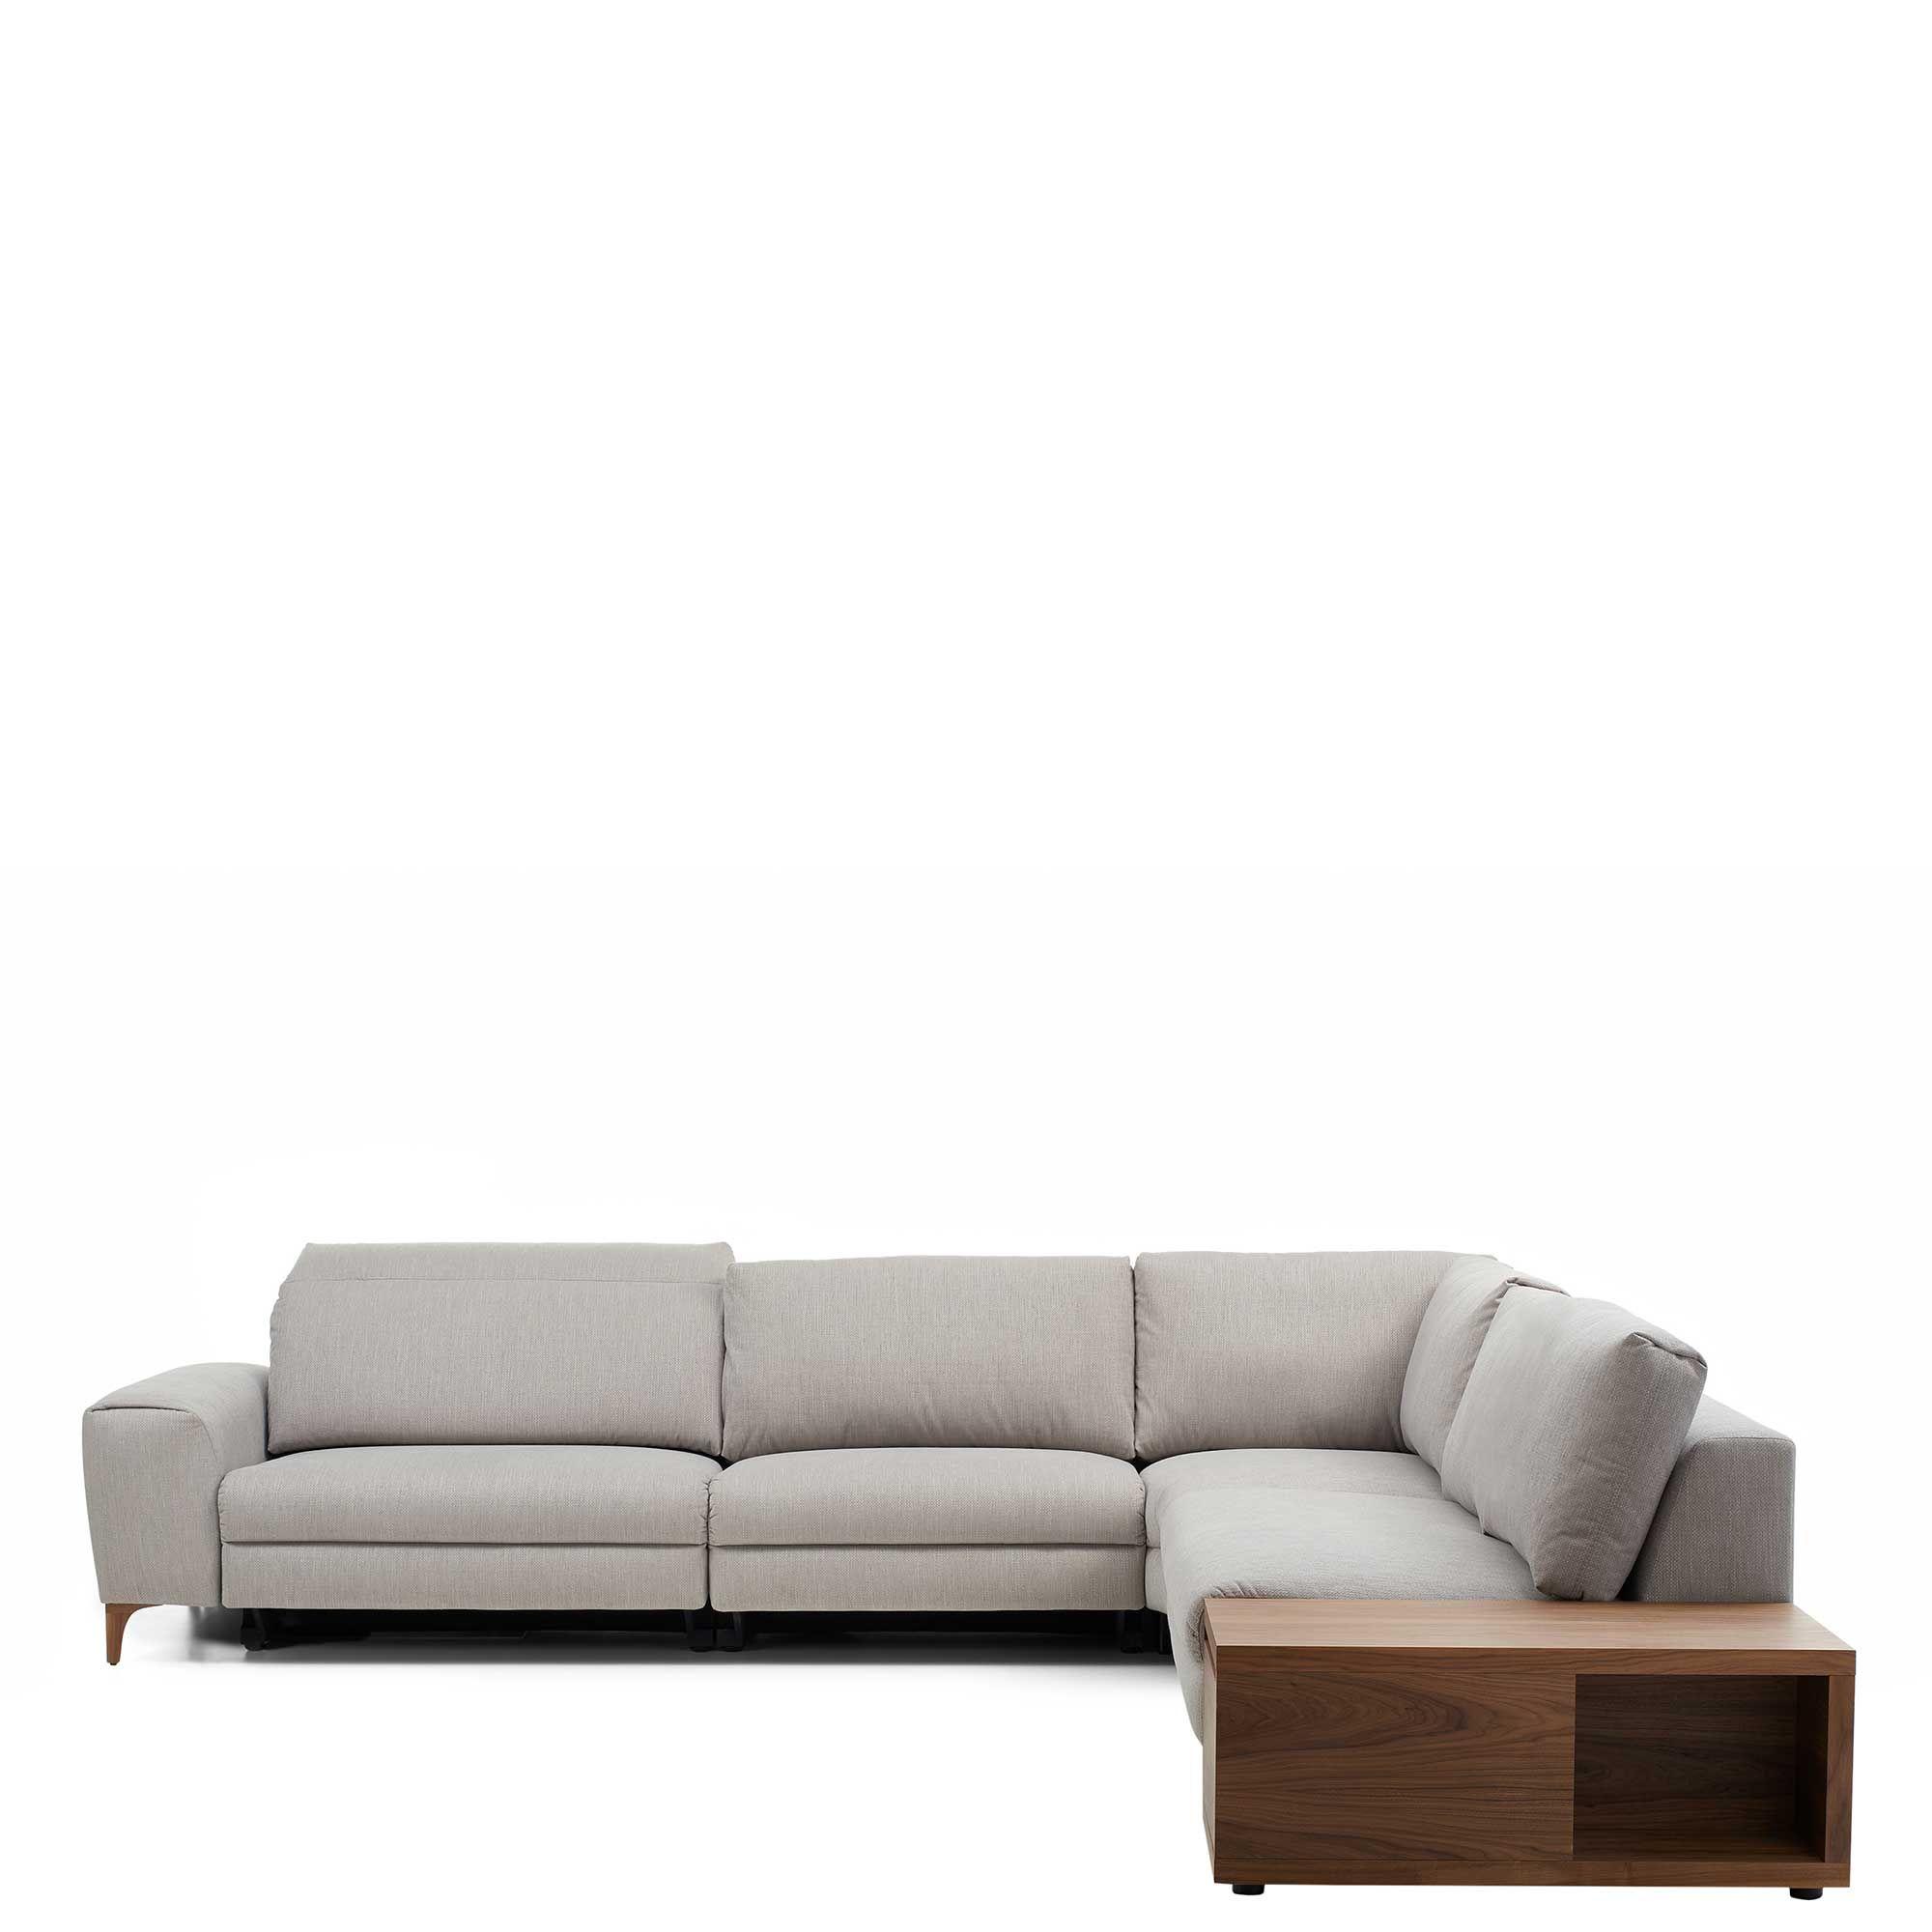 blending contemporary style with innovative modular design the sydney corner group boasts a stunning slim corner sofa living roomliving